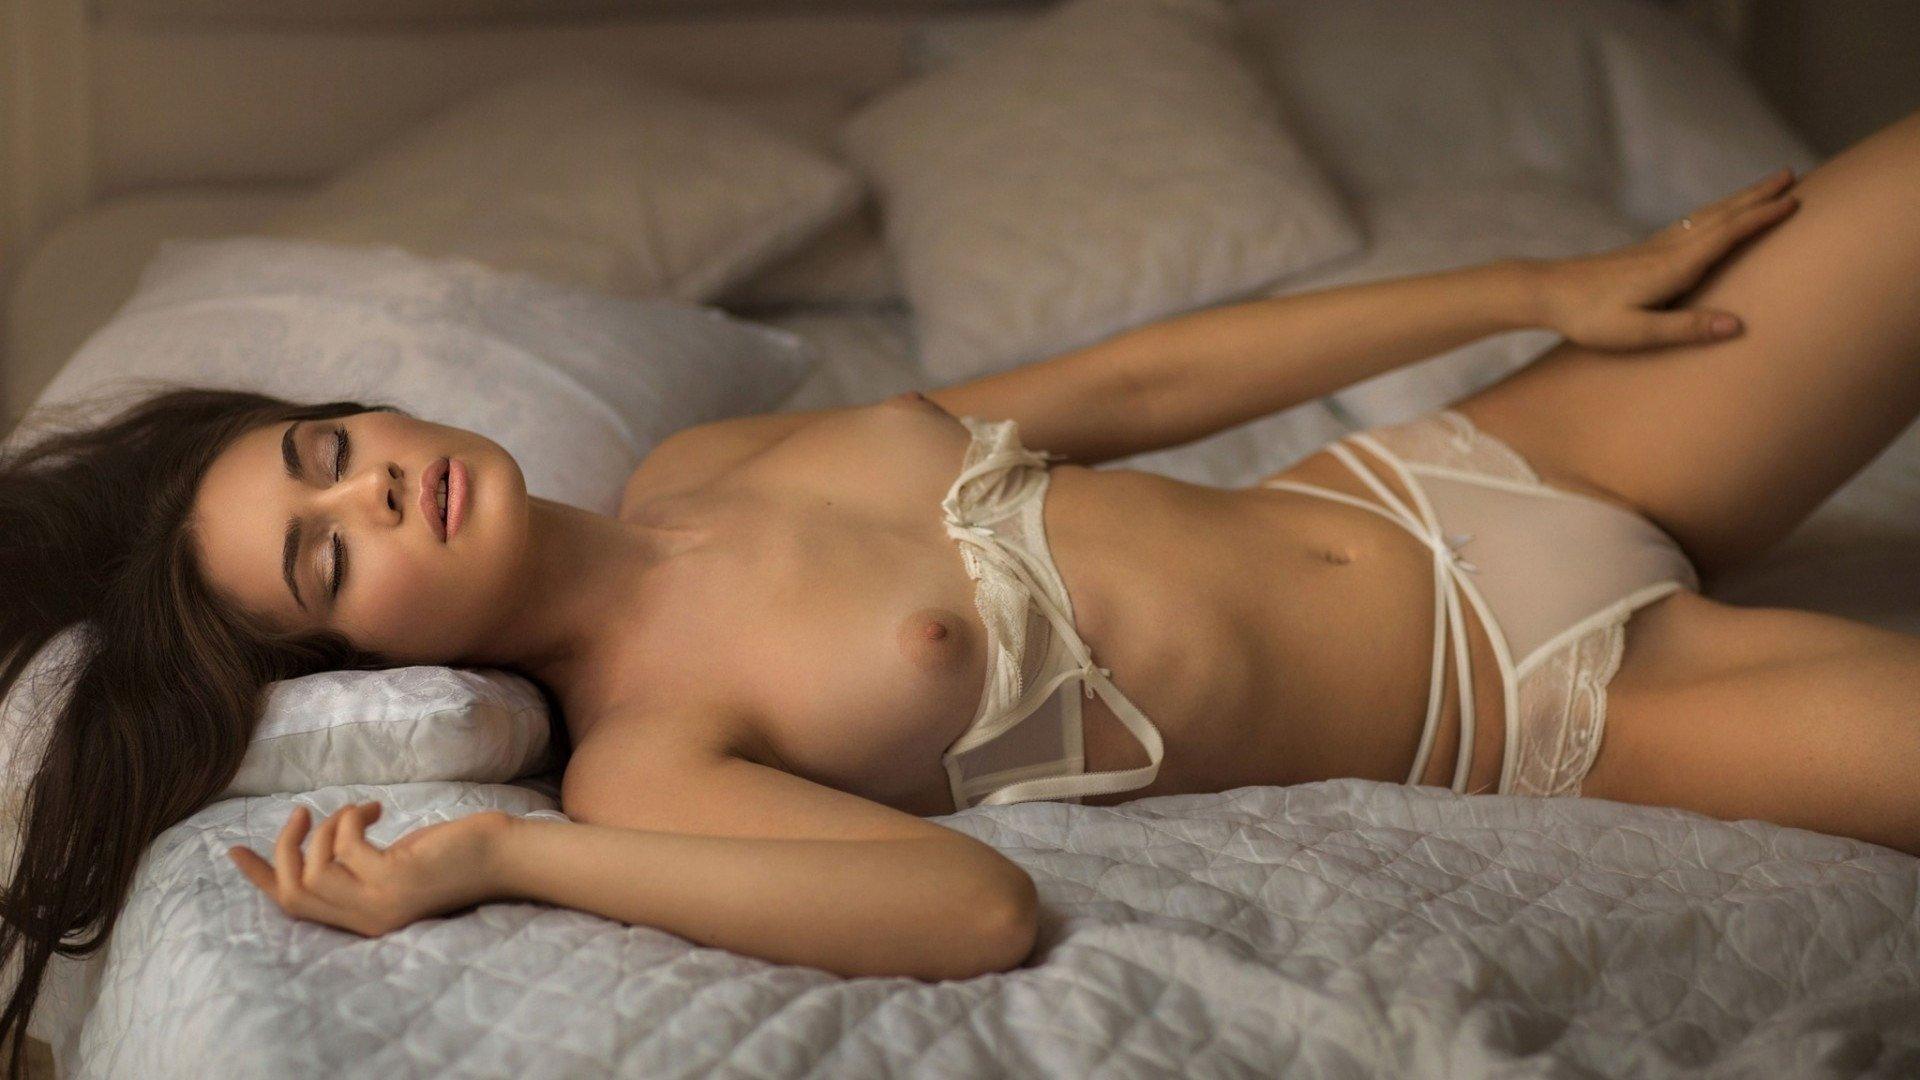 Horny Webcam Girls Want You To Watch Them Having Fun